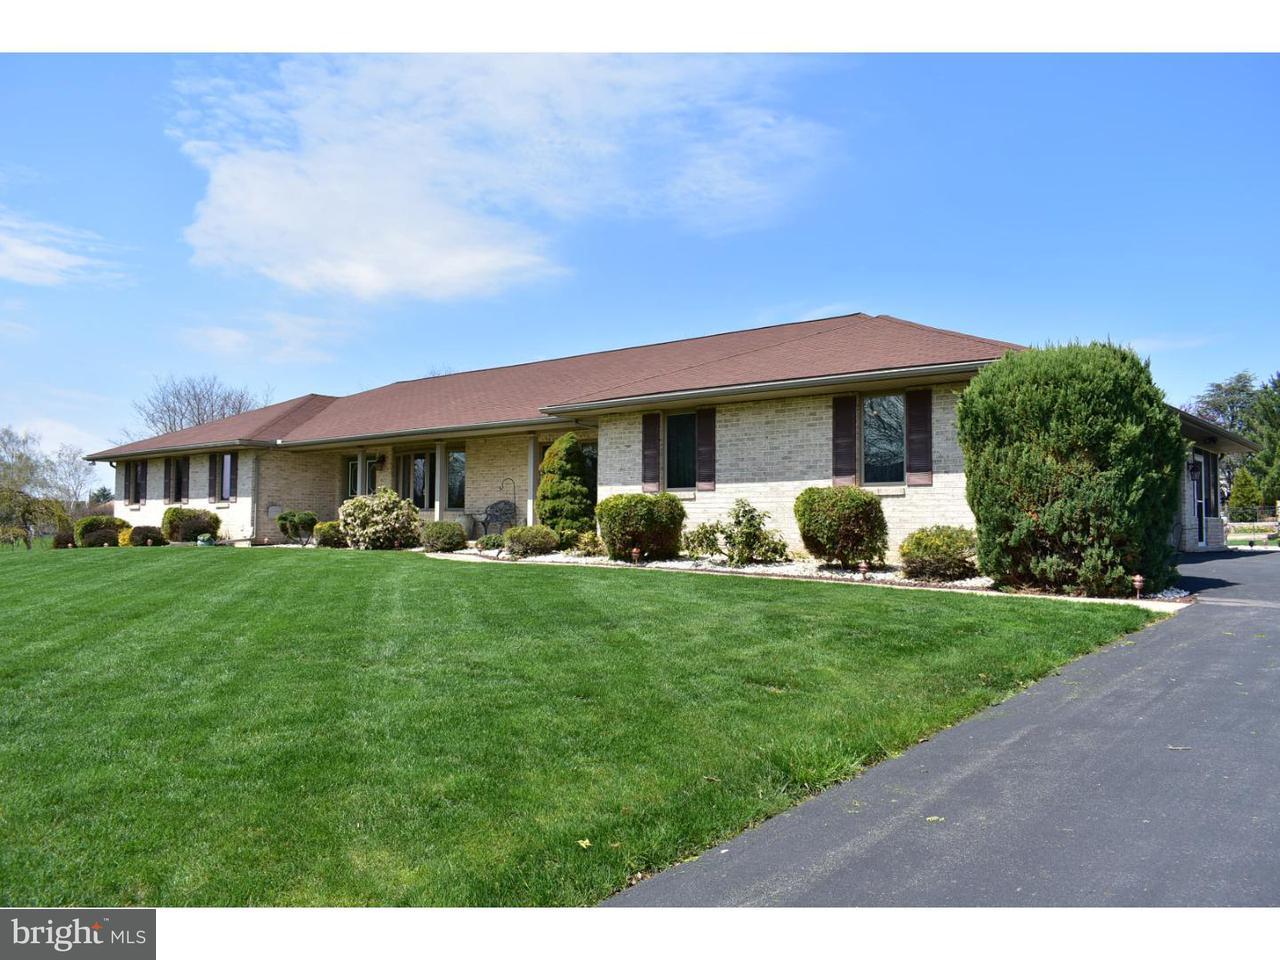 Casa Unifamiliar por un Venta en 9425 LISA Lane Breinigsville, Pennsylvania 18031 Estados Unidos